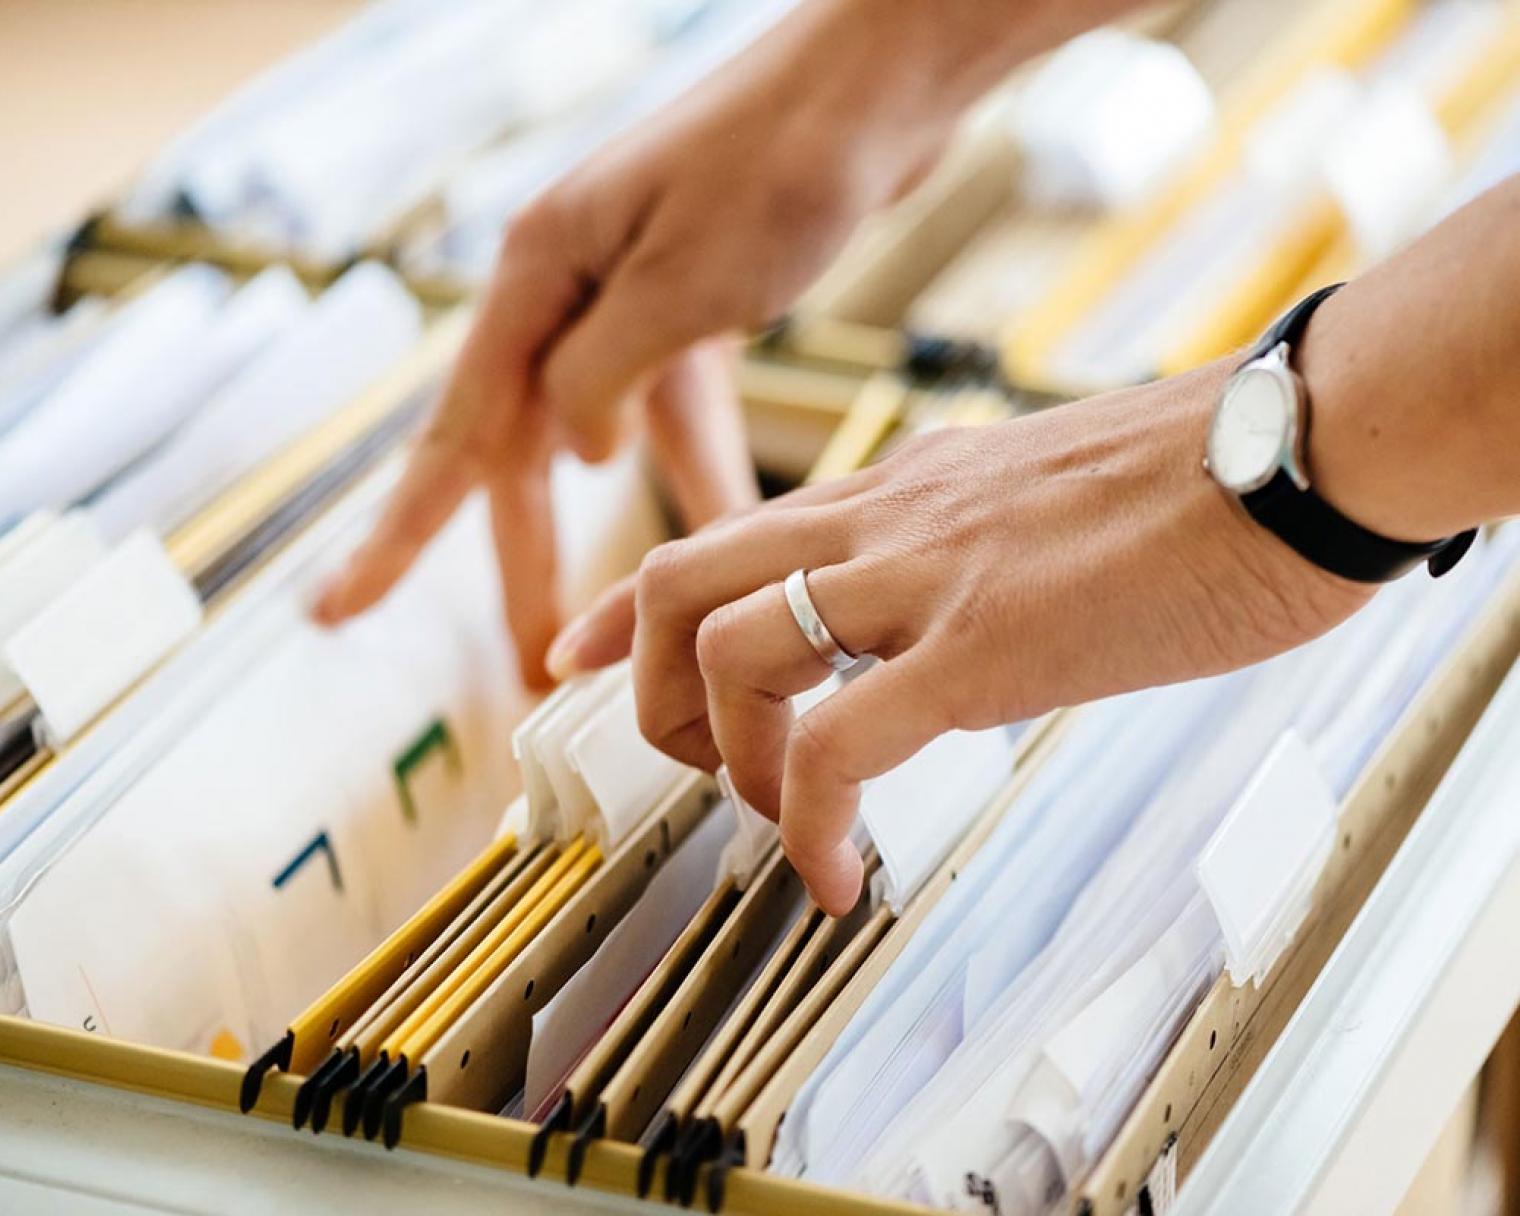 Browsing manual files and envelopes